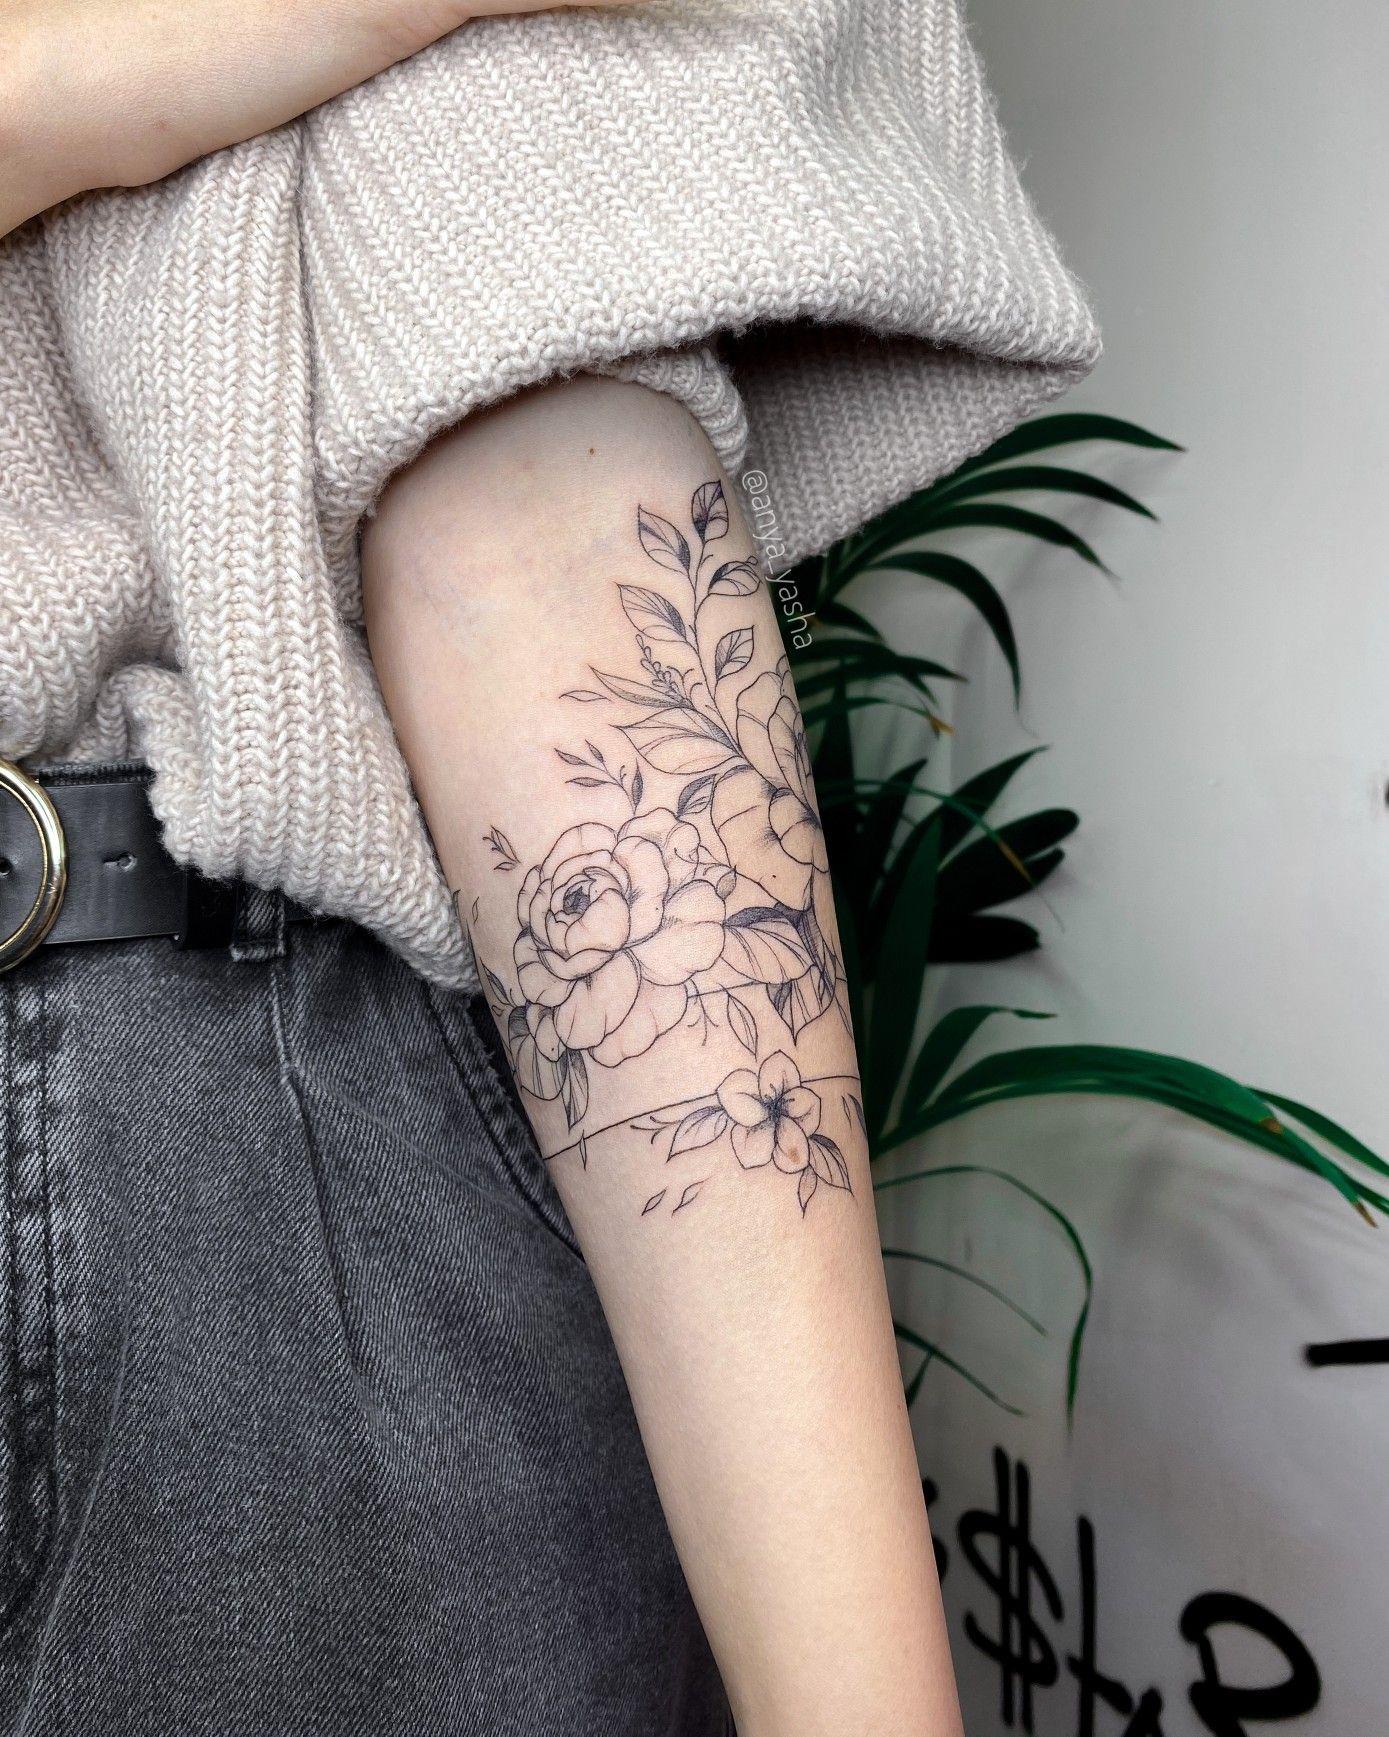 #flowertattoo #finelinetattoo #tattoobracelet #atmtattoo #tattoogirl